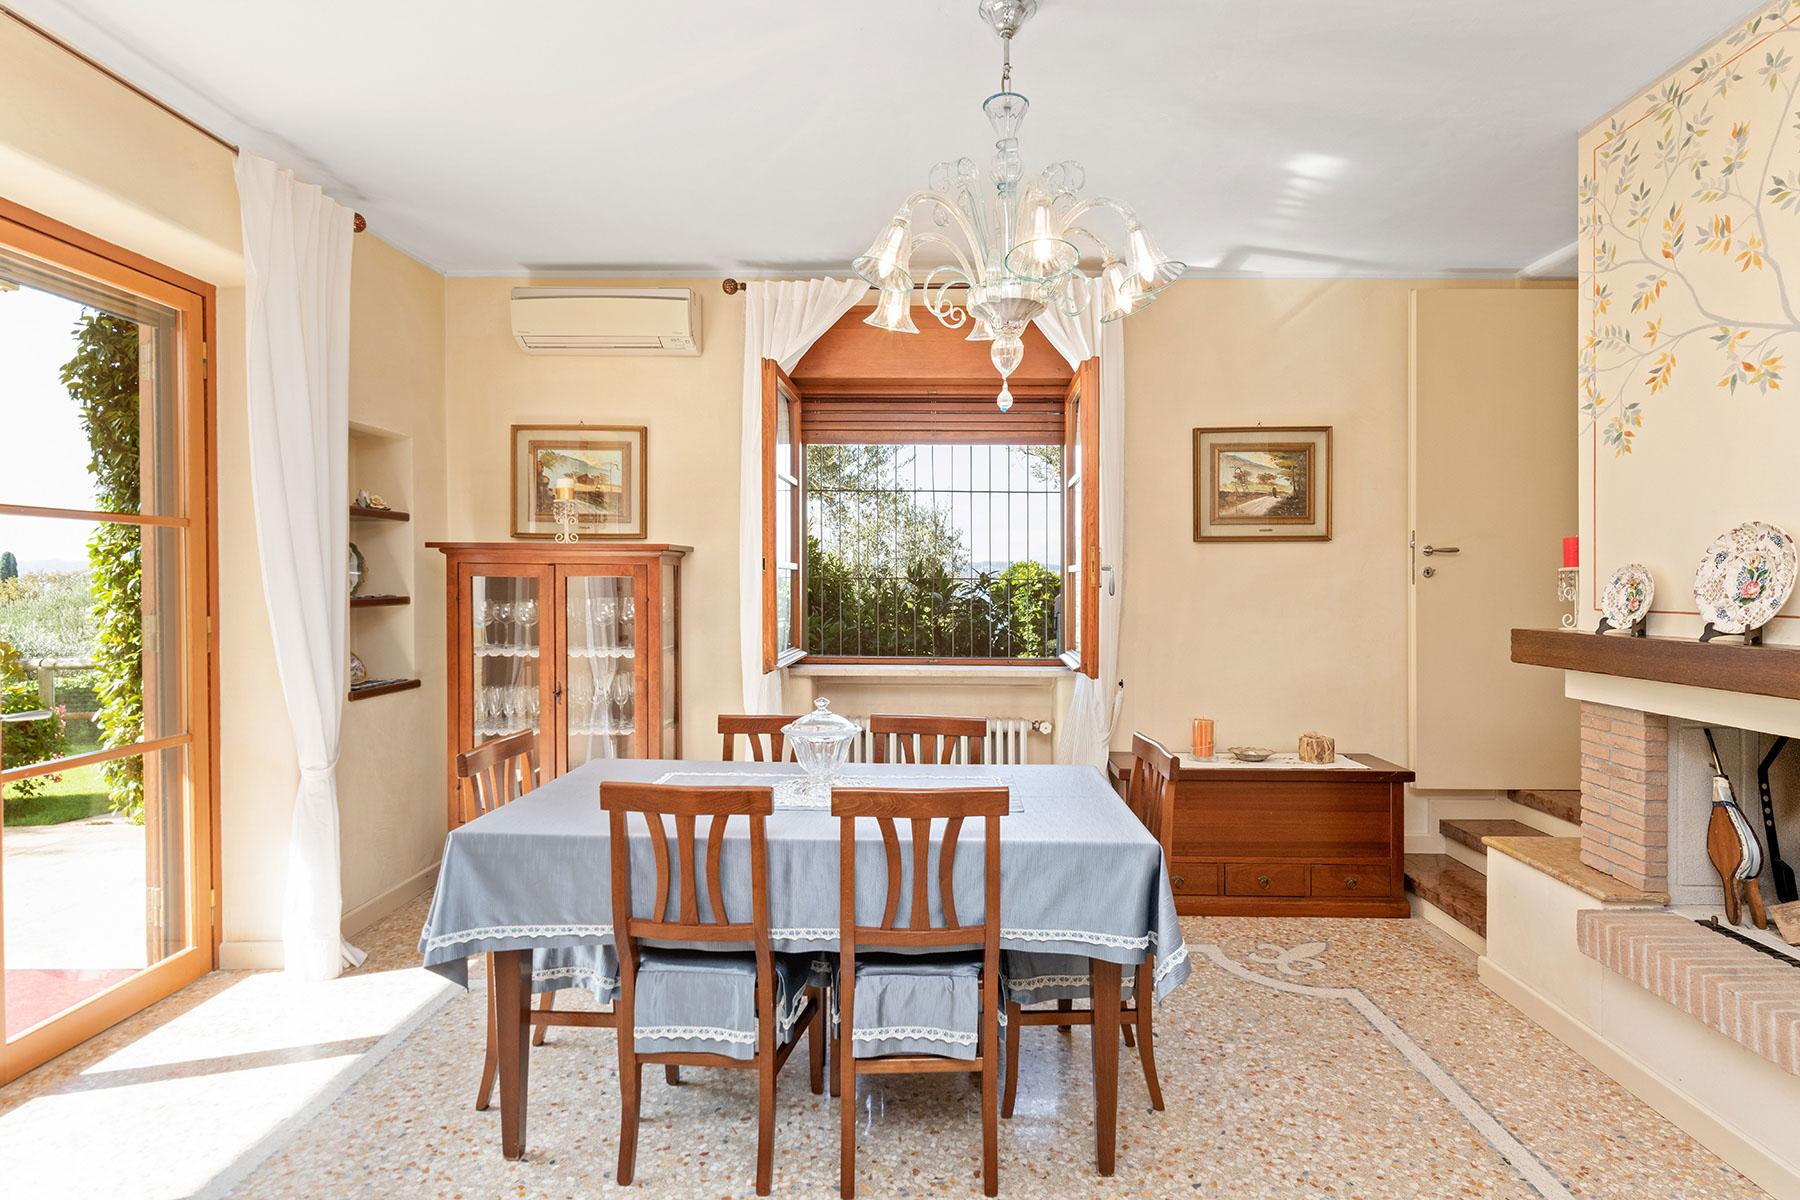 Villa in Vendita a Sirmione: 5 locali, 500 mq - Foto 13